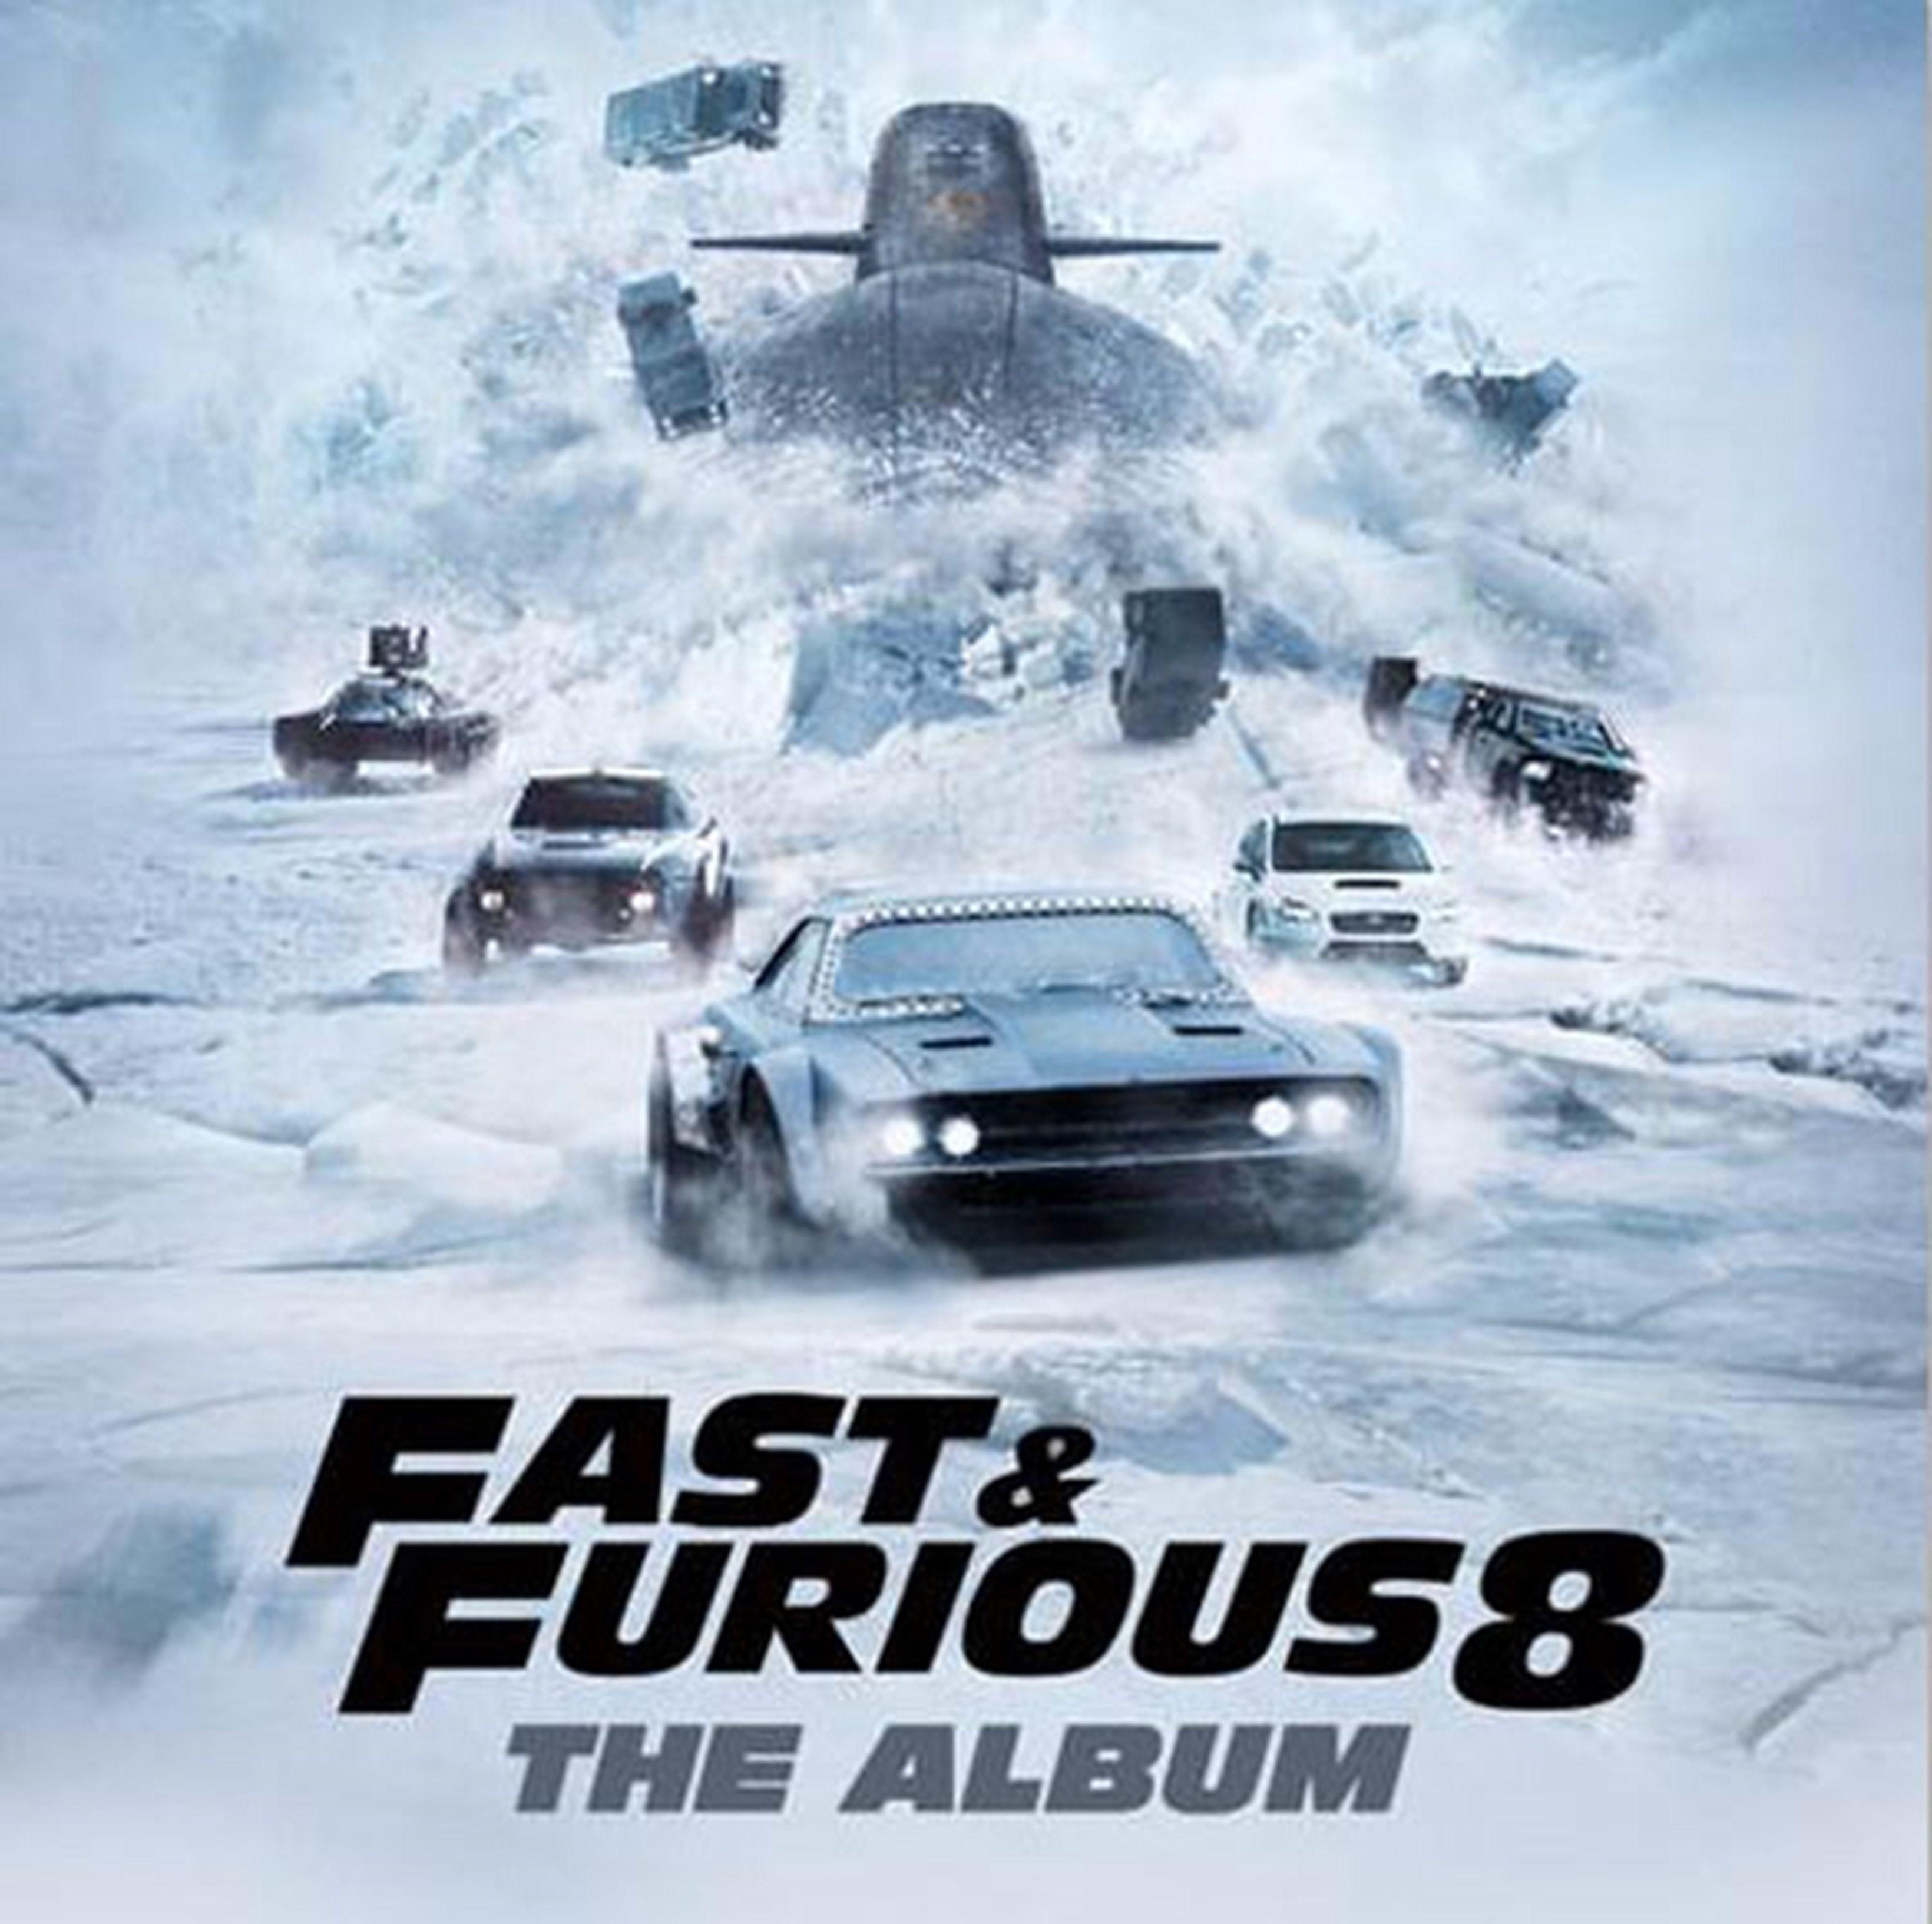 Fast & Furious 8: The Album | CD Album | Free shipping